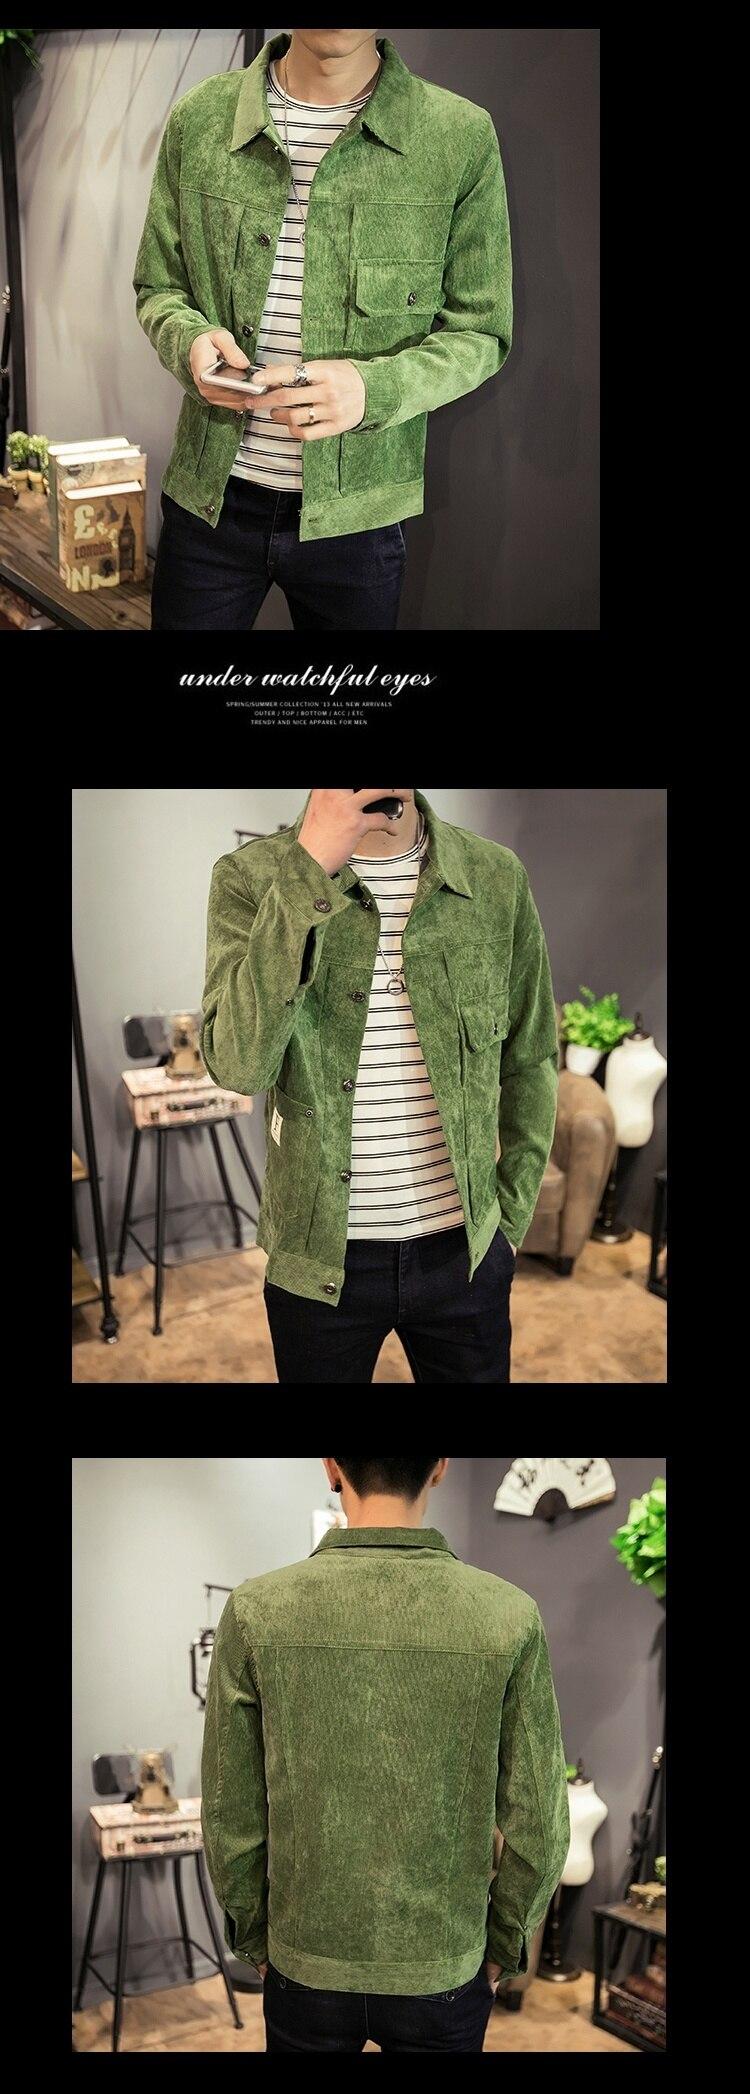 H6ed50a8b6d154719b7af6792a652e36fq Zongke Japan Style Corduroy Jacket Men Hip Hop Streetwear Men Jacket Coat Windbreaker Clothes Bomber Jacket Men 5XL 2019 New